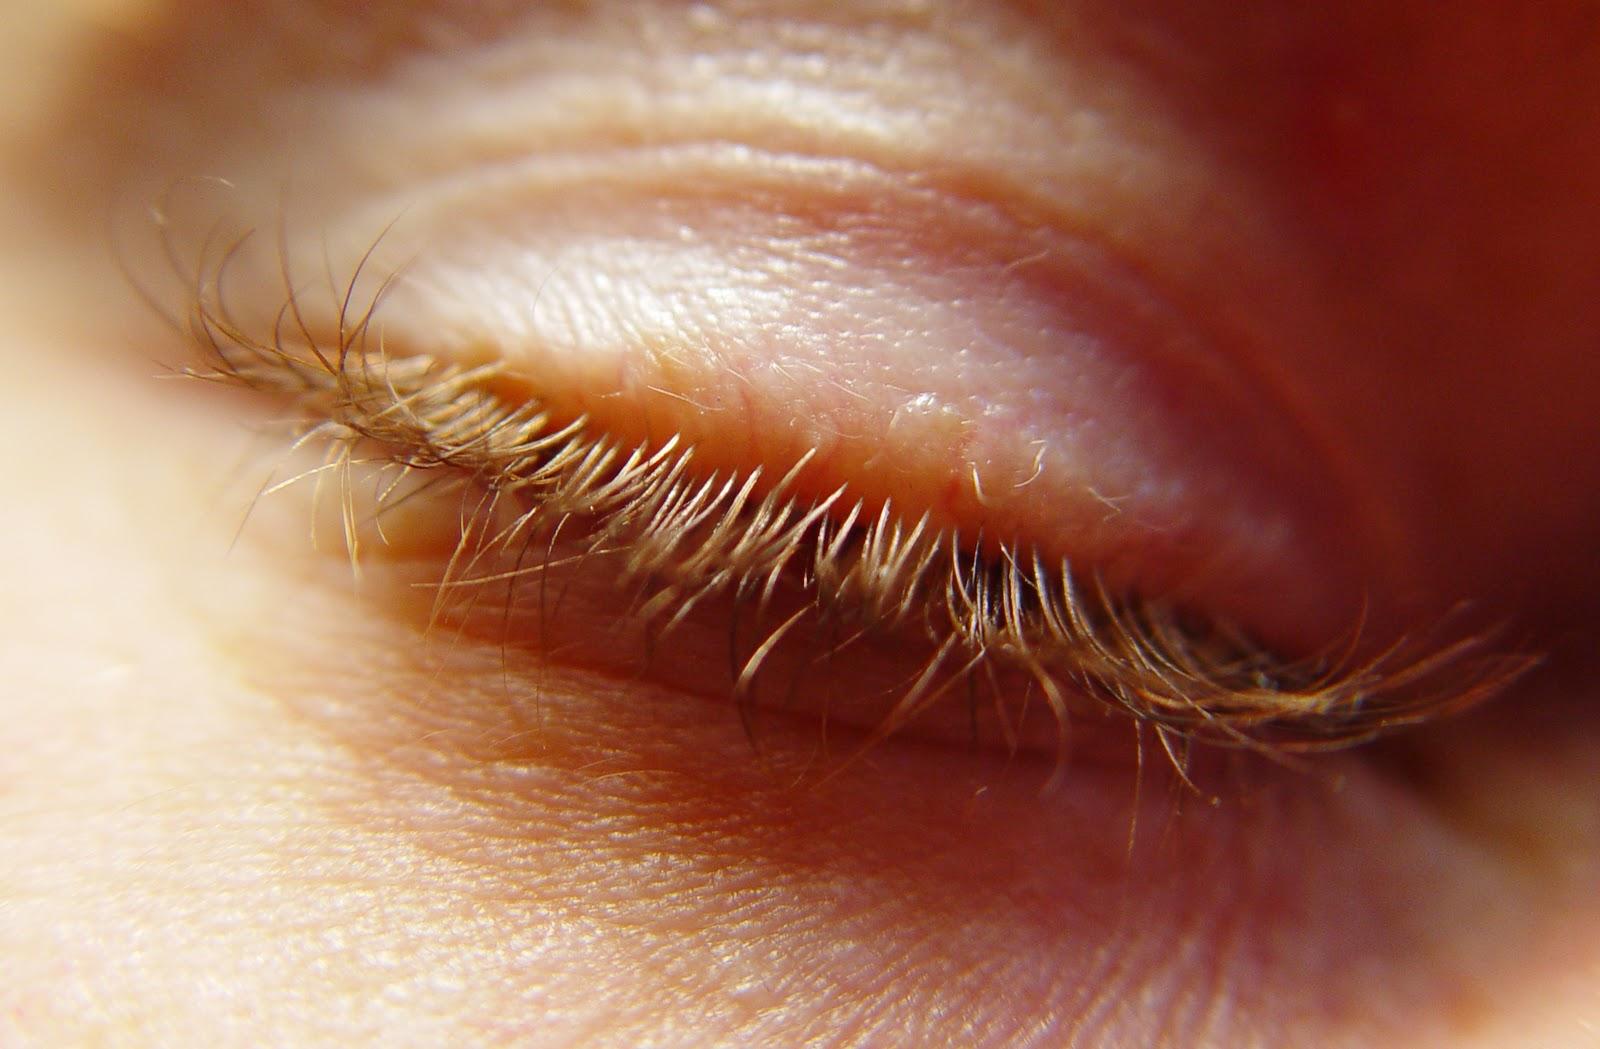 dizziness headache blurred vision fainting sleeplessness